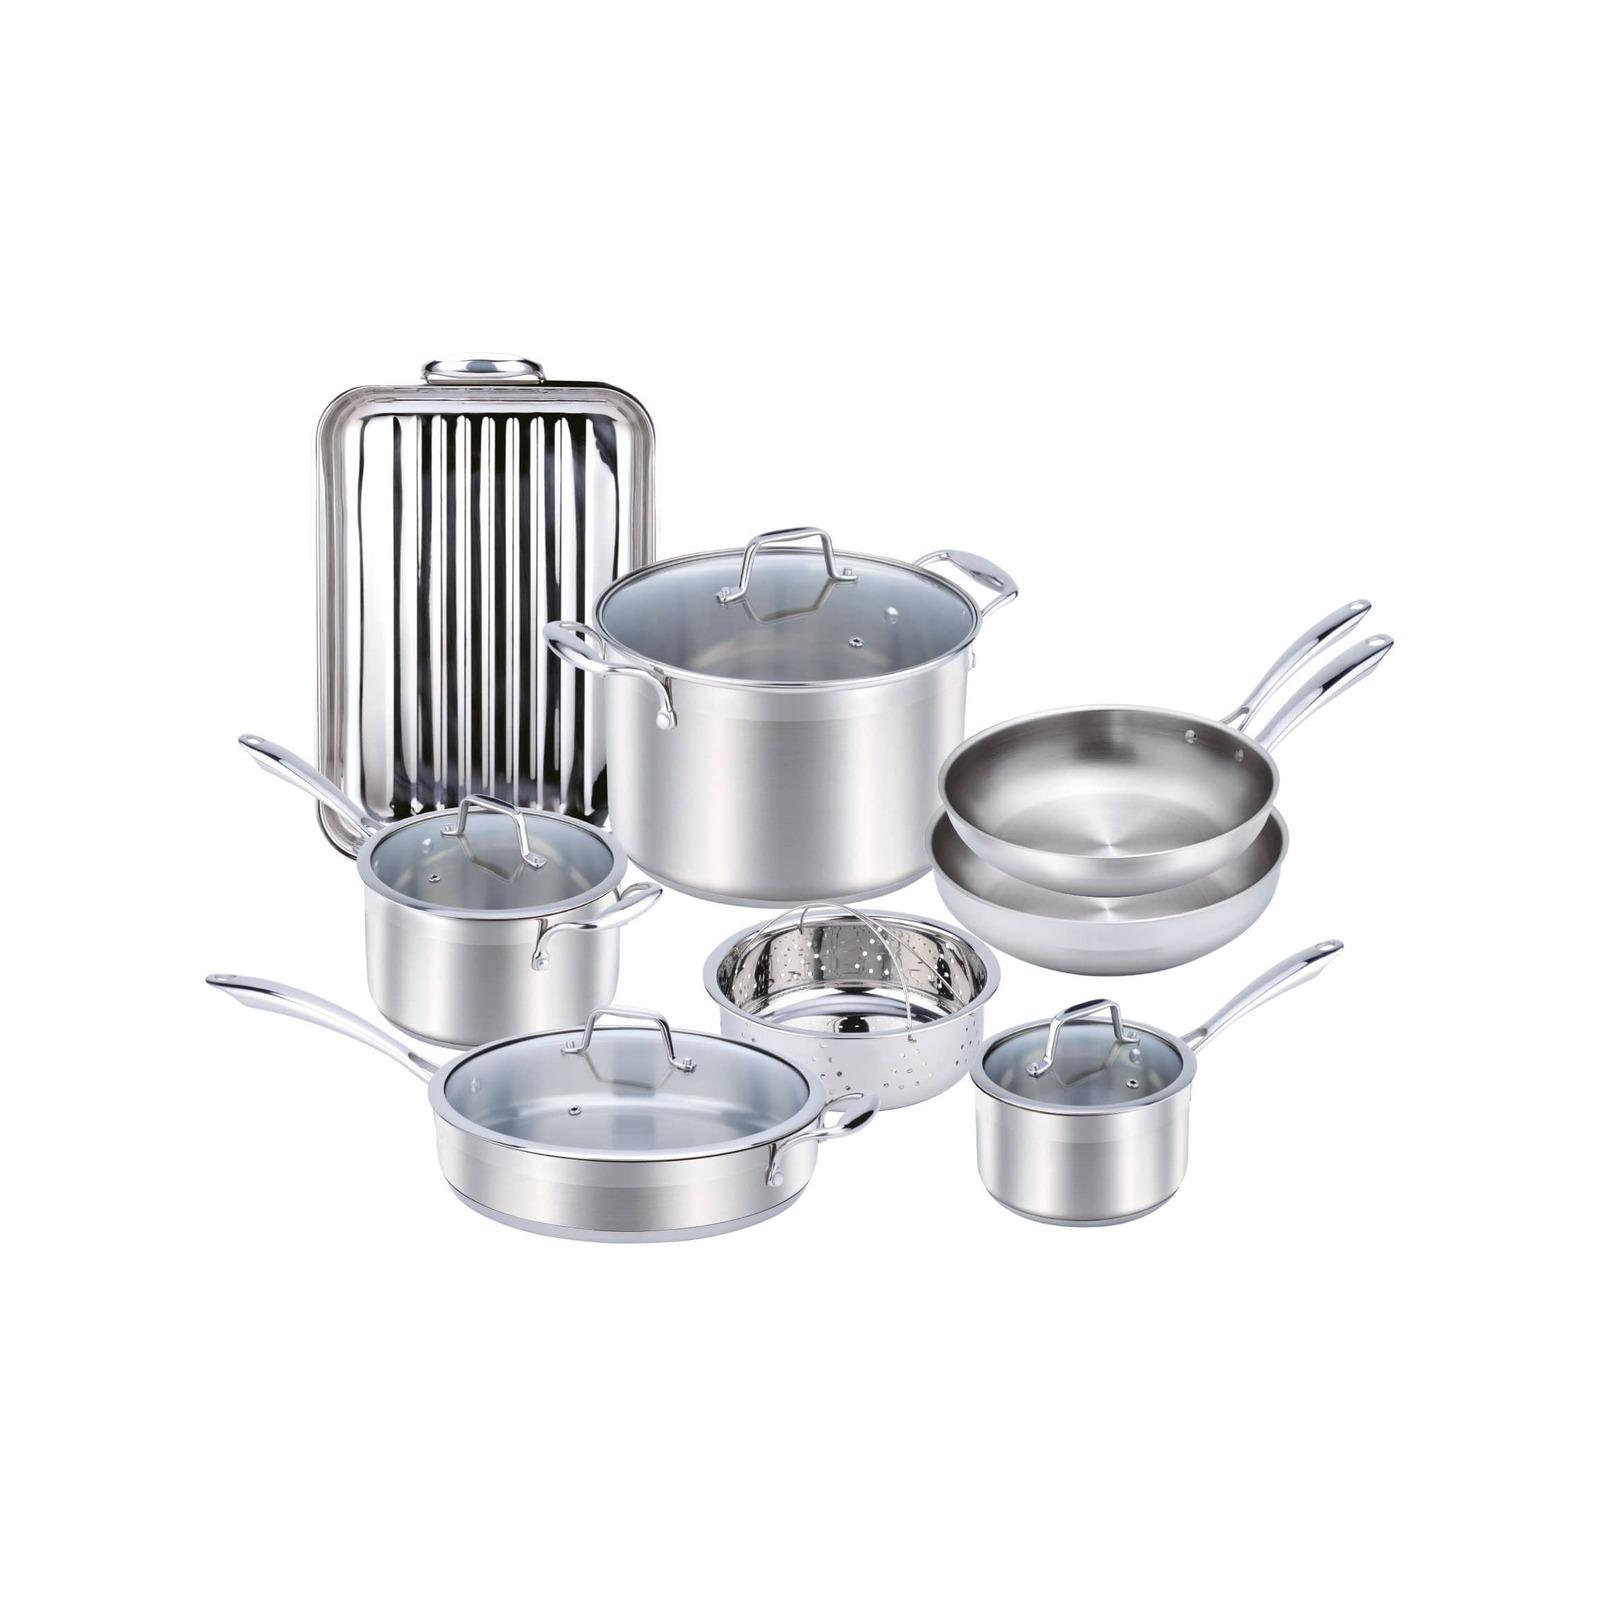 Wolstead Steeltek Stainless Steel 8pc Cookware Set